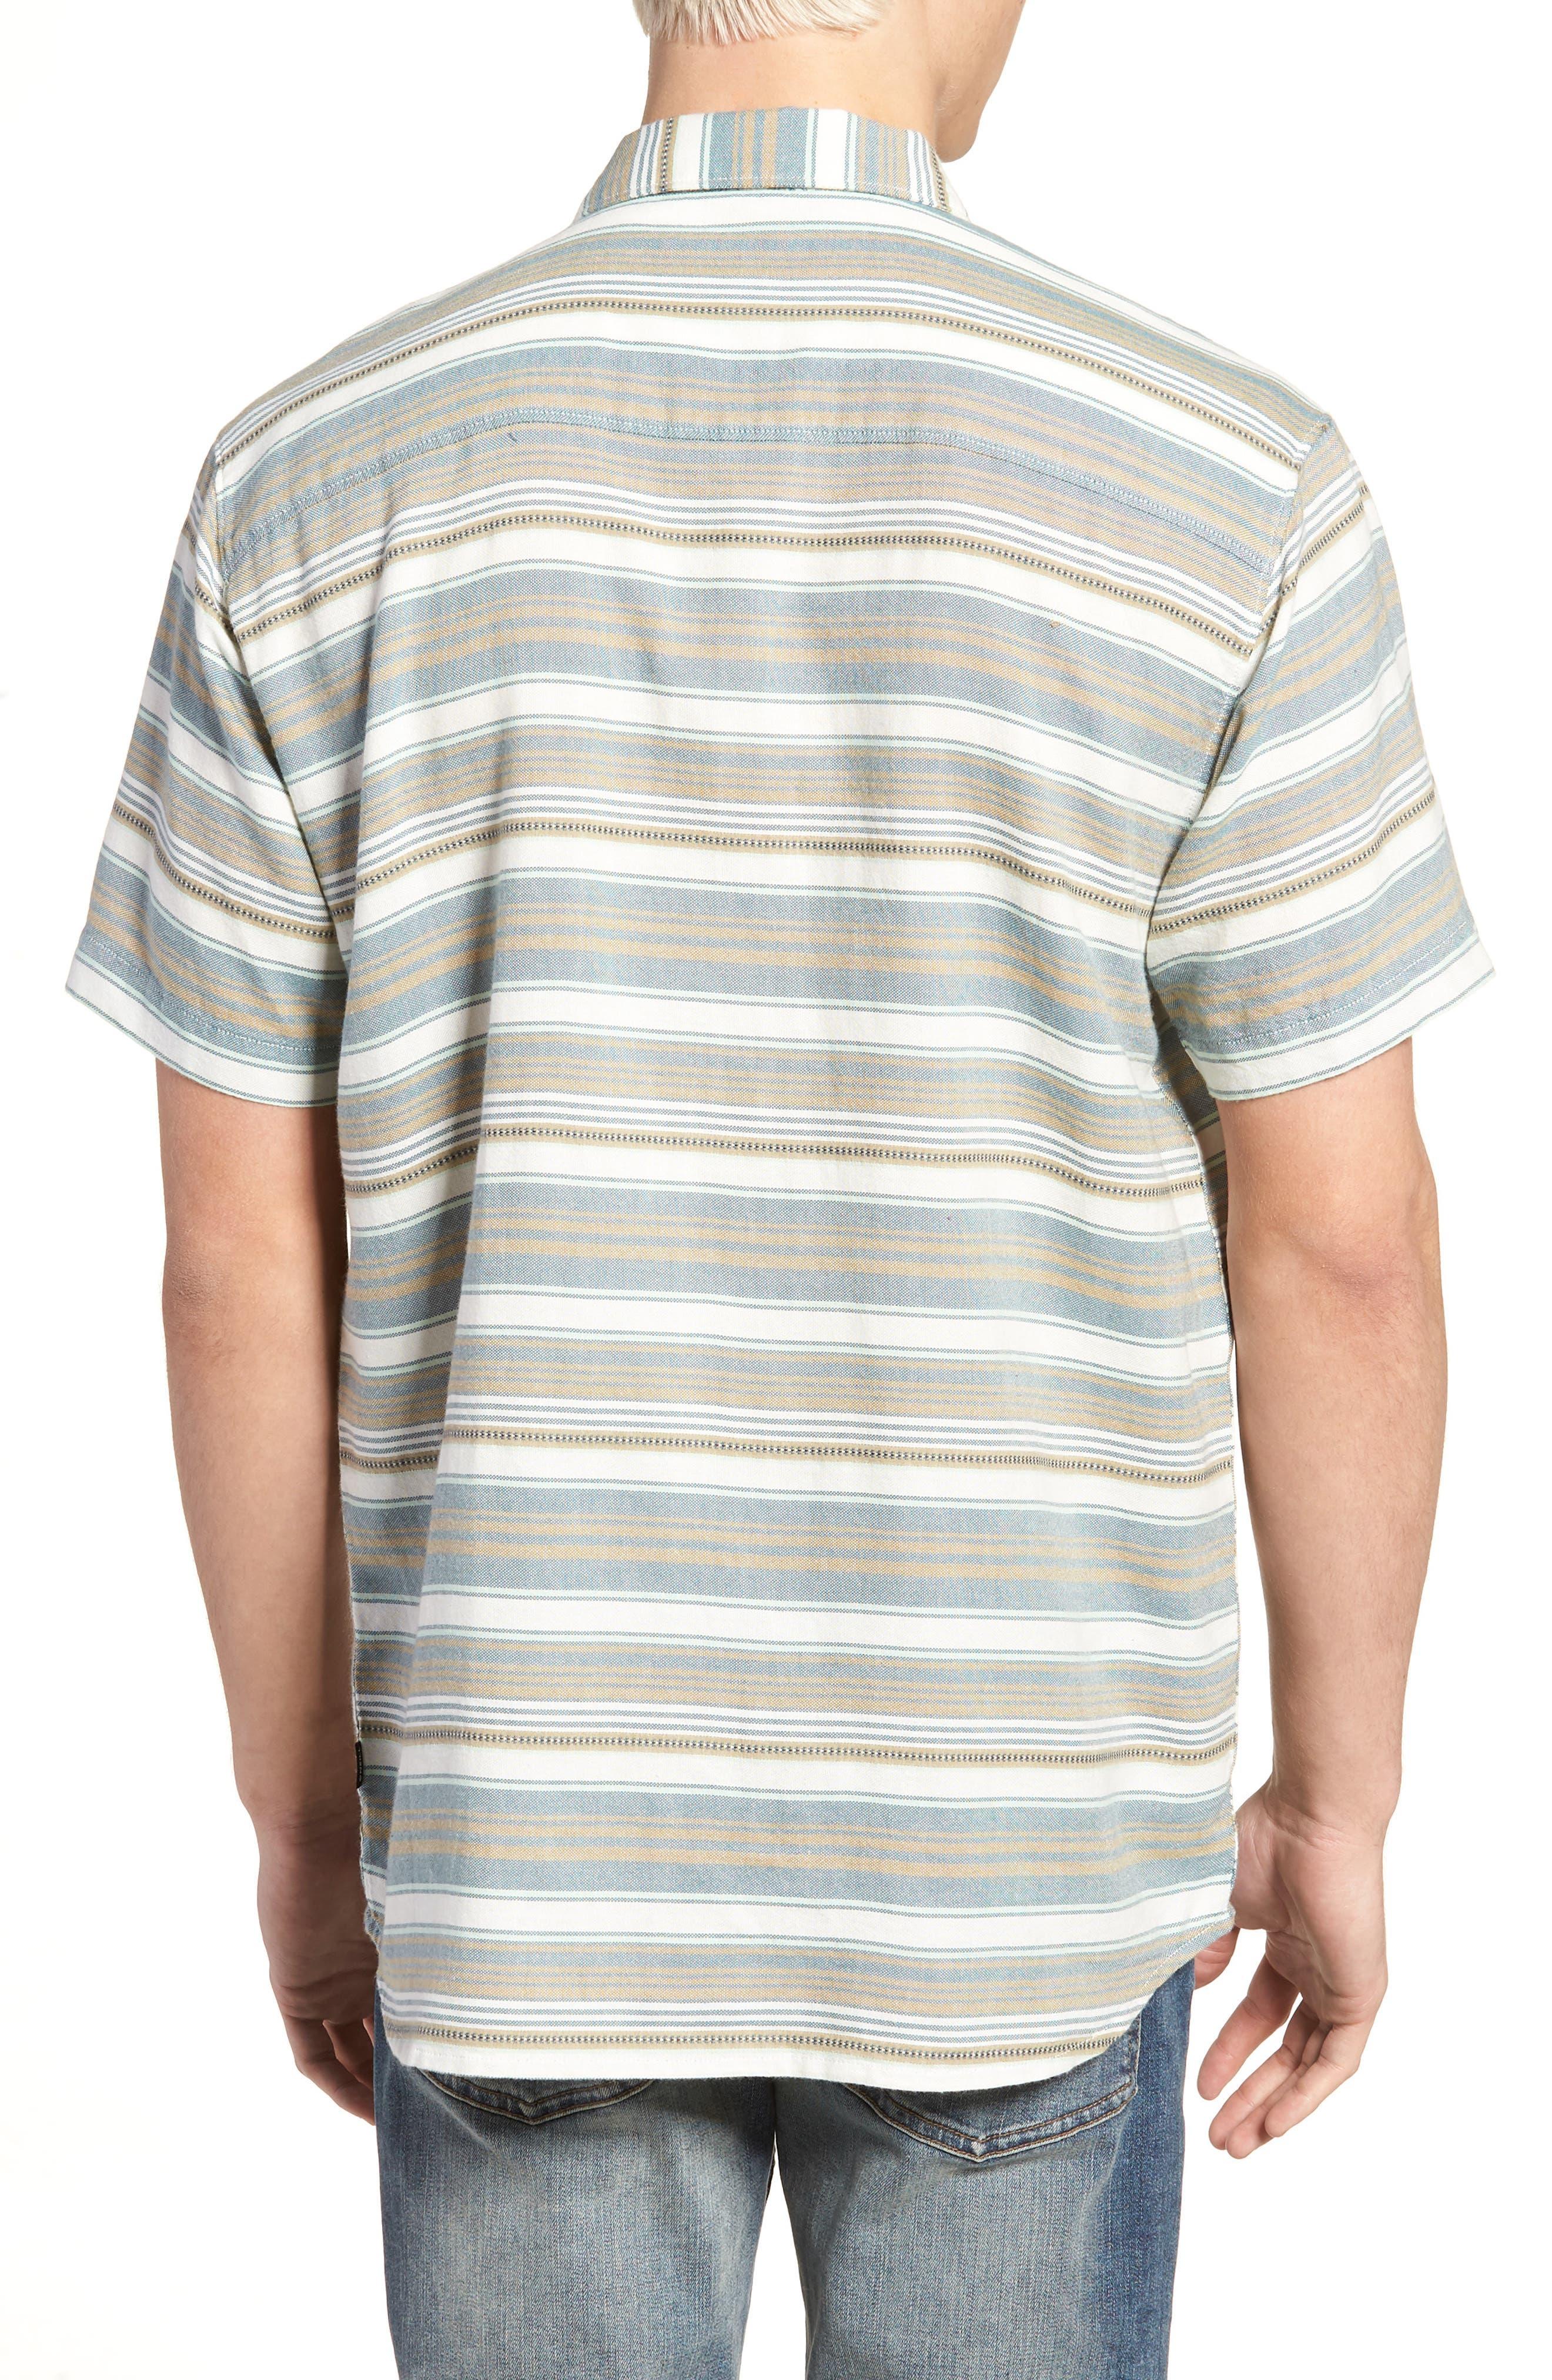 Currington Short Sleeve Shirt,                             Alternate thumbnail 2, color,                             Khaki